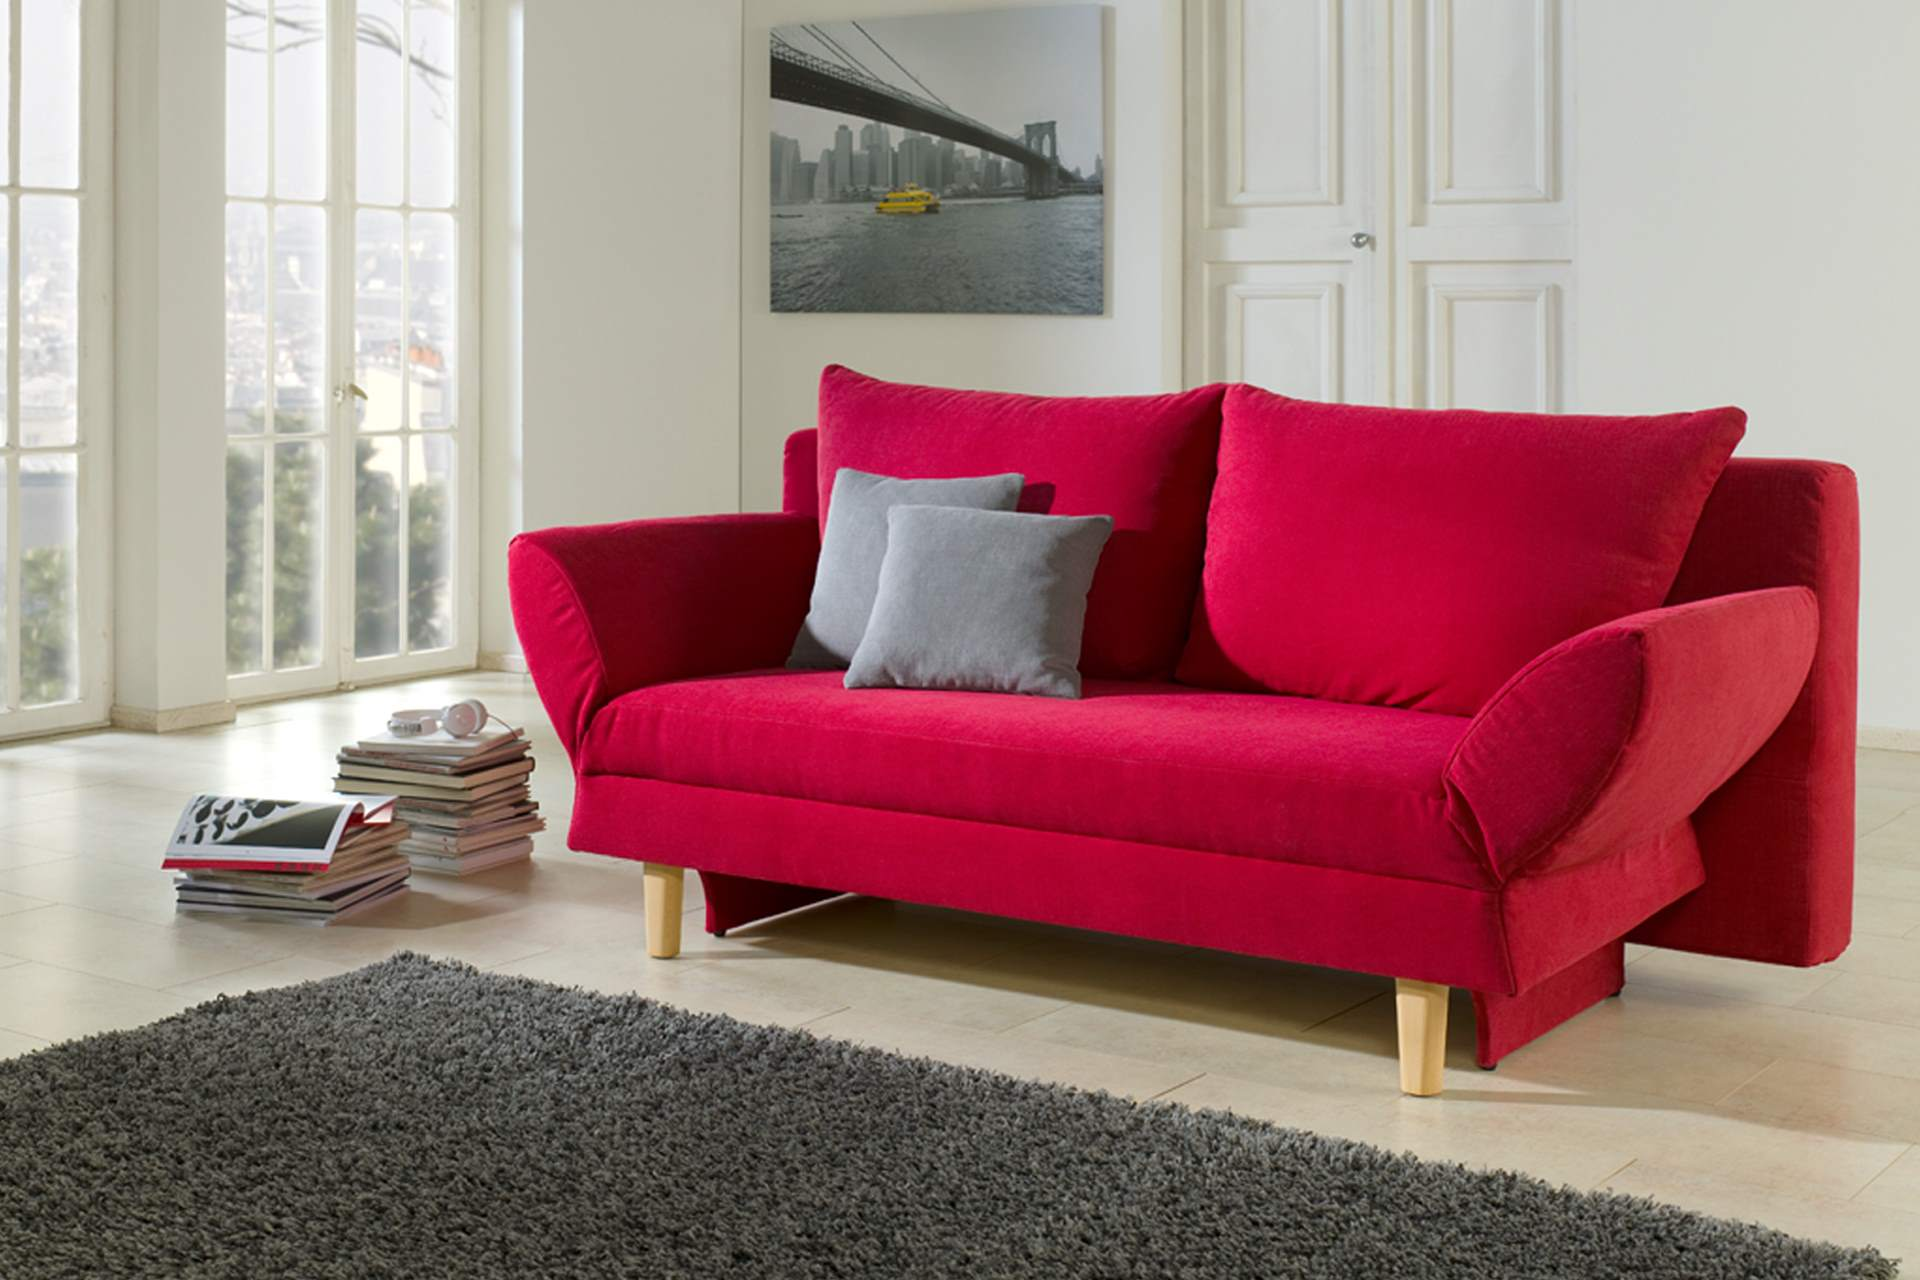 querschl fersofa vincenza wohnopposition berlin. Black Bedroom Furniture Sets. Home Design Ideas